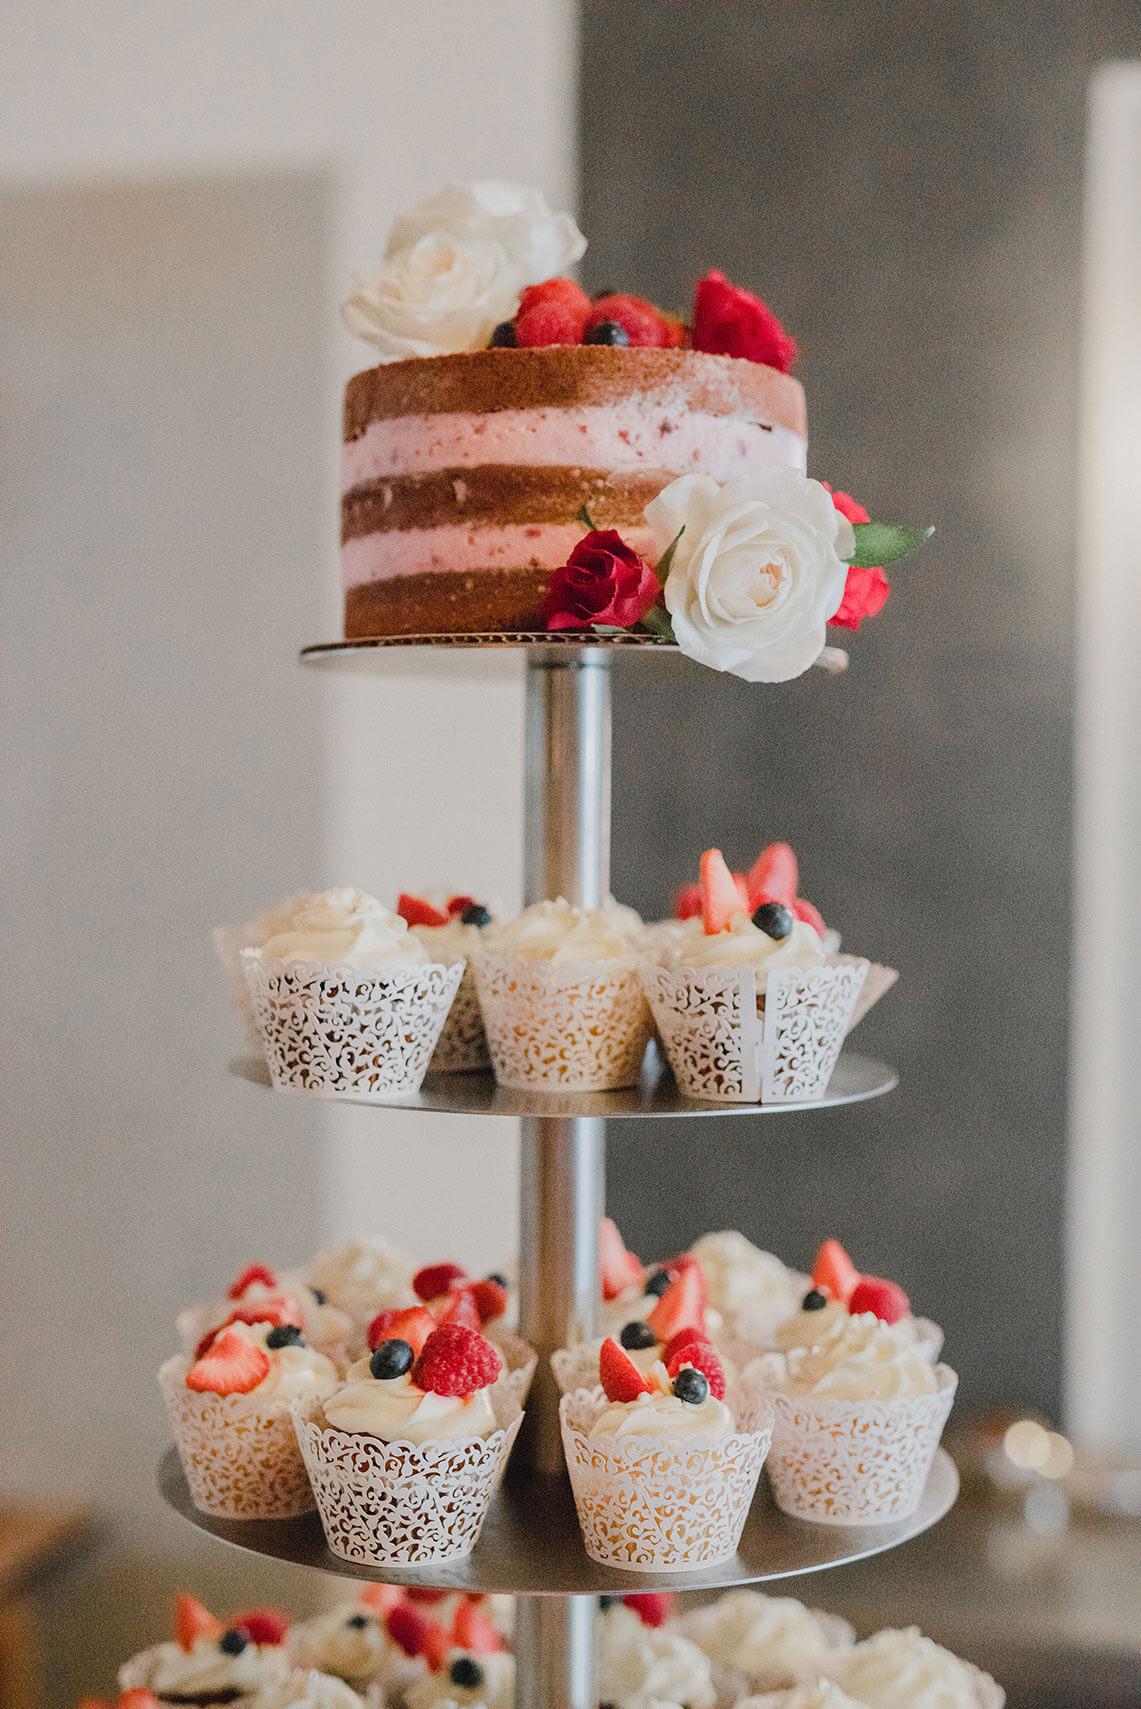 Cupcake anstatt Torte